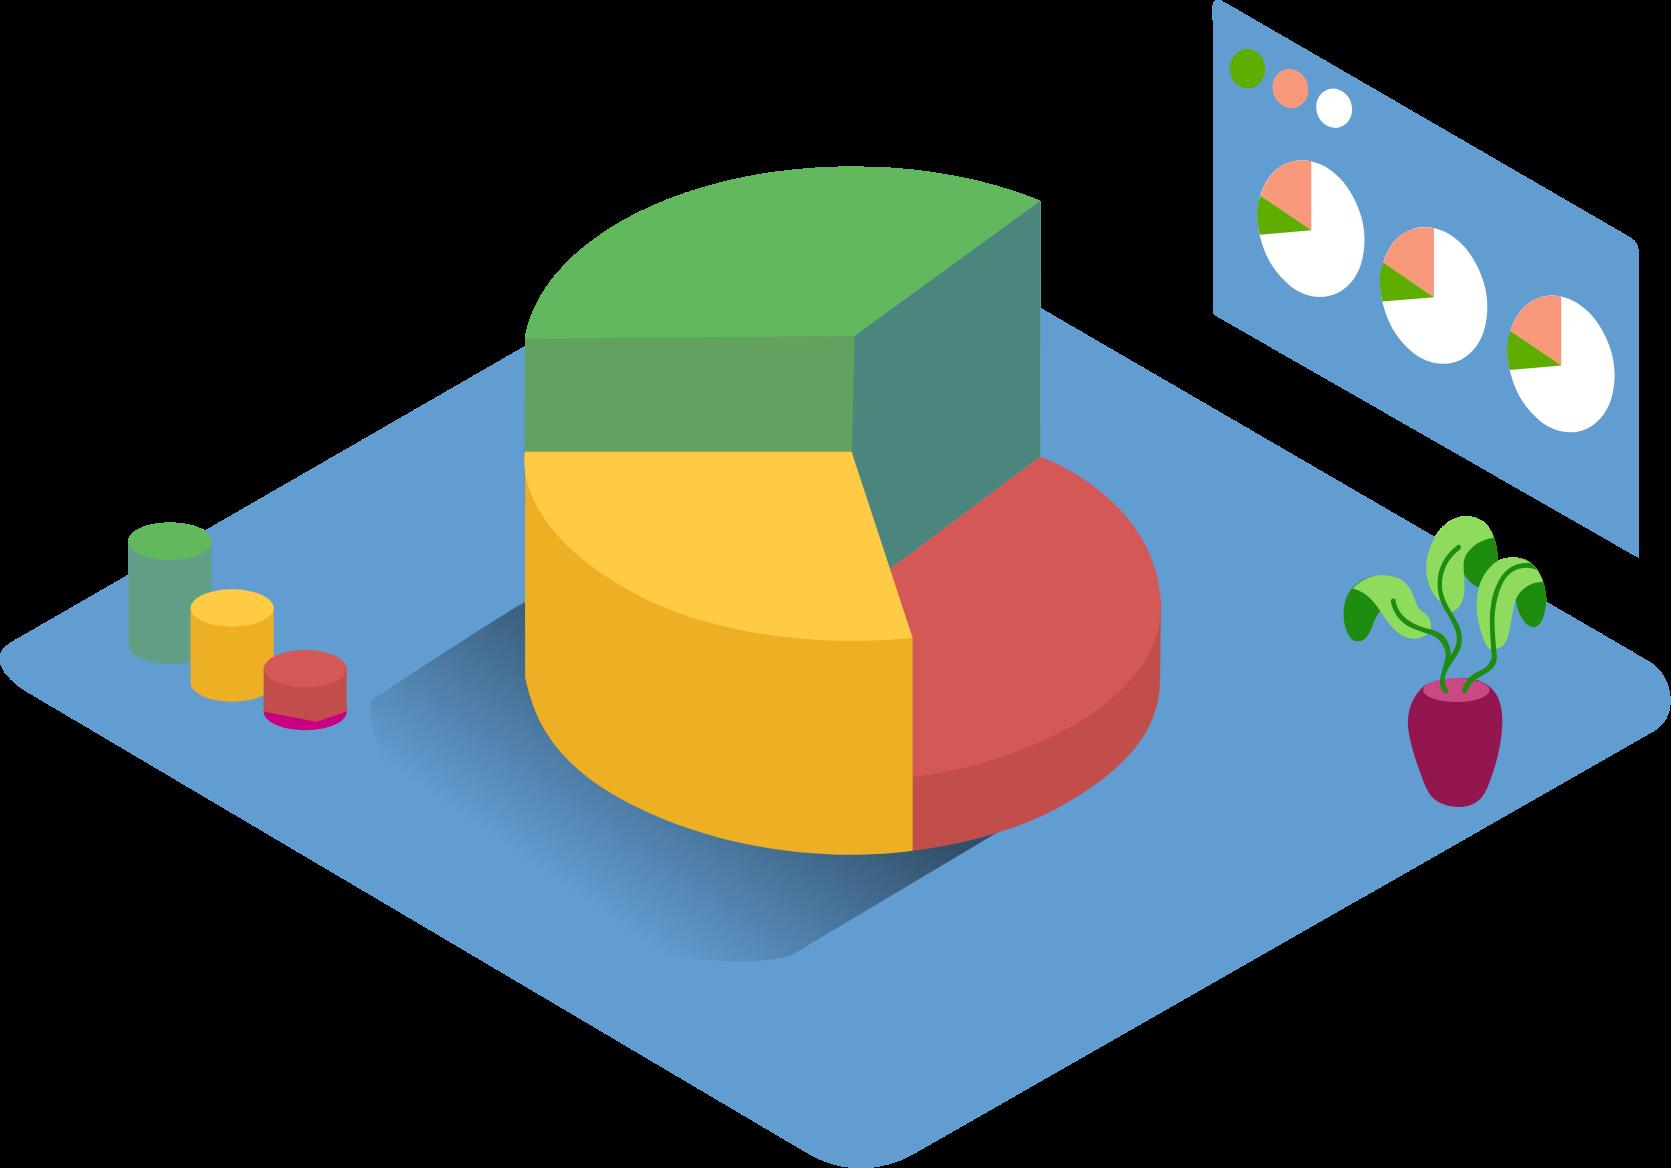 Pie chart _Isometric